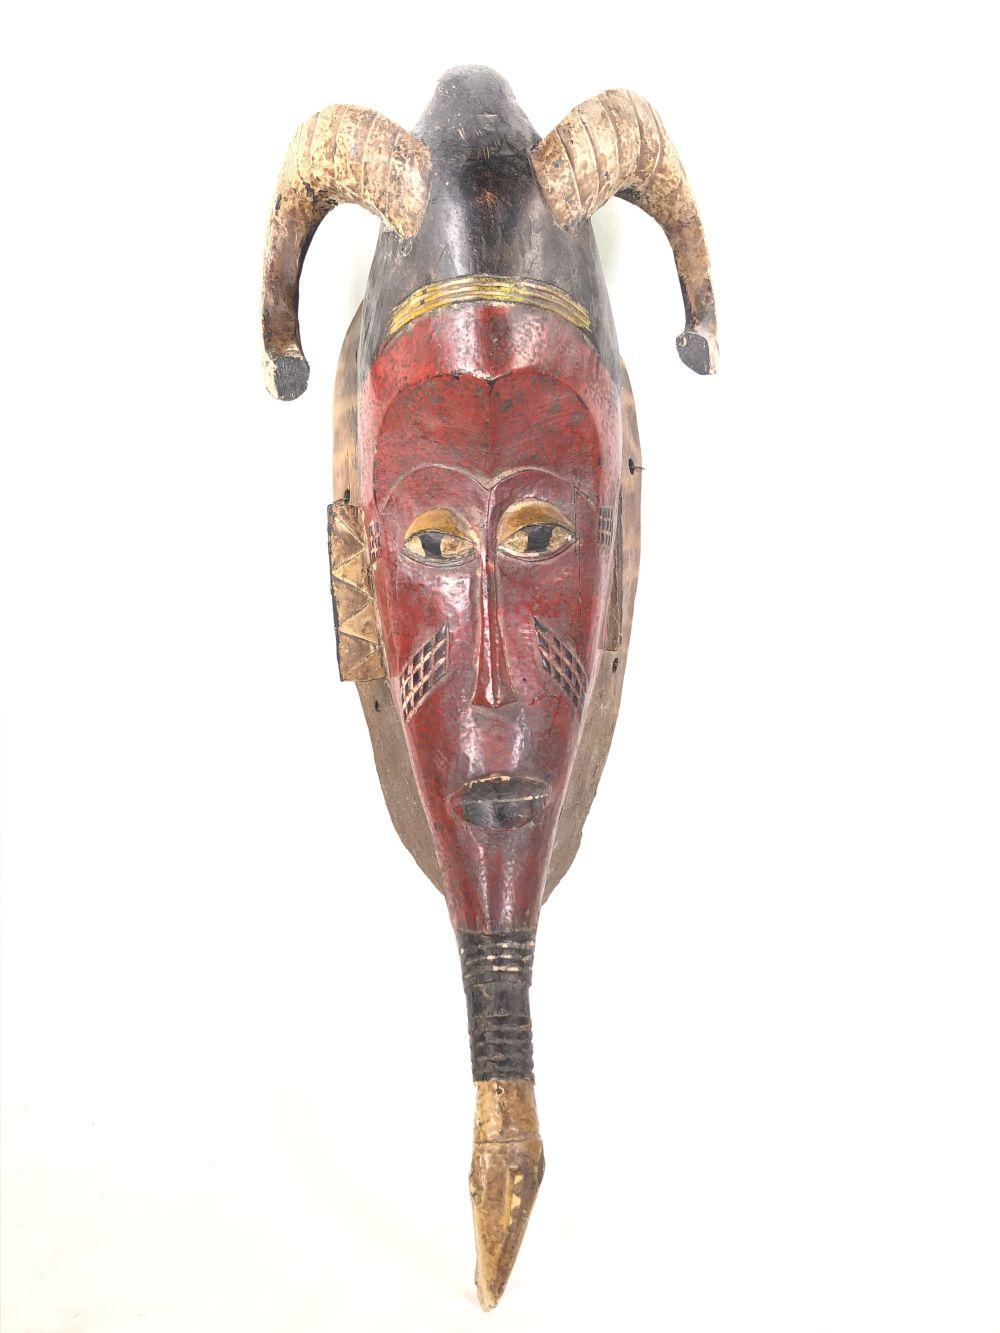 Guro Ivory Coast Red Horn Mask